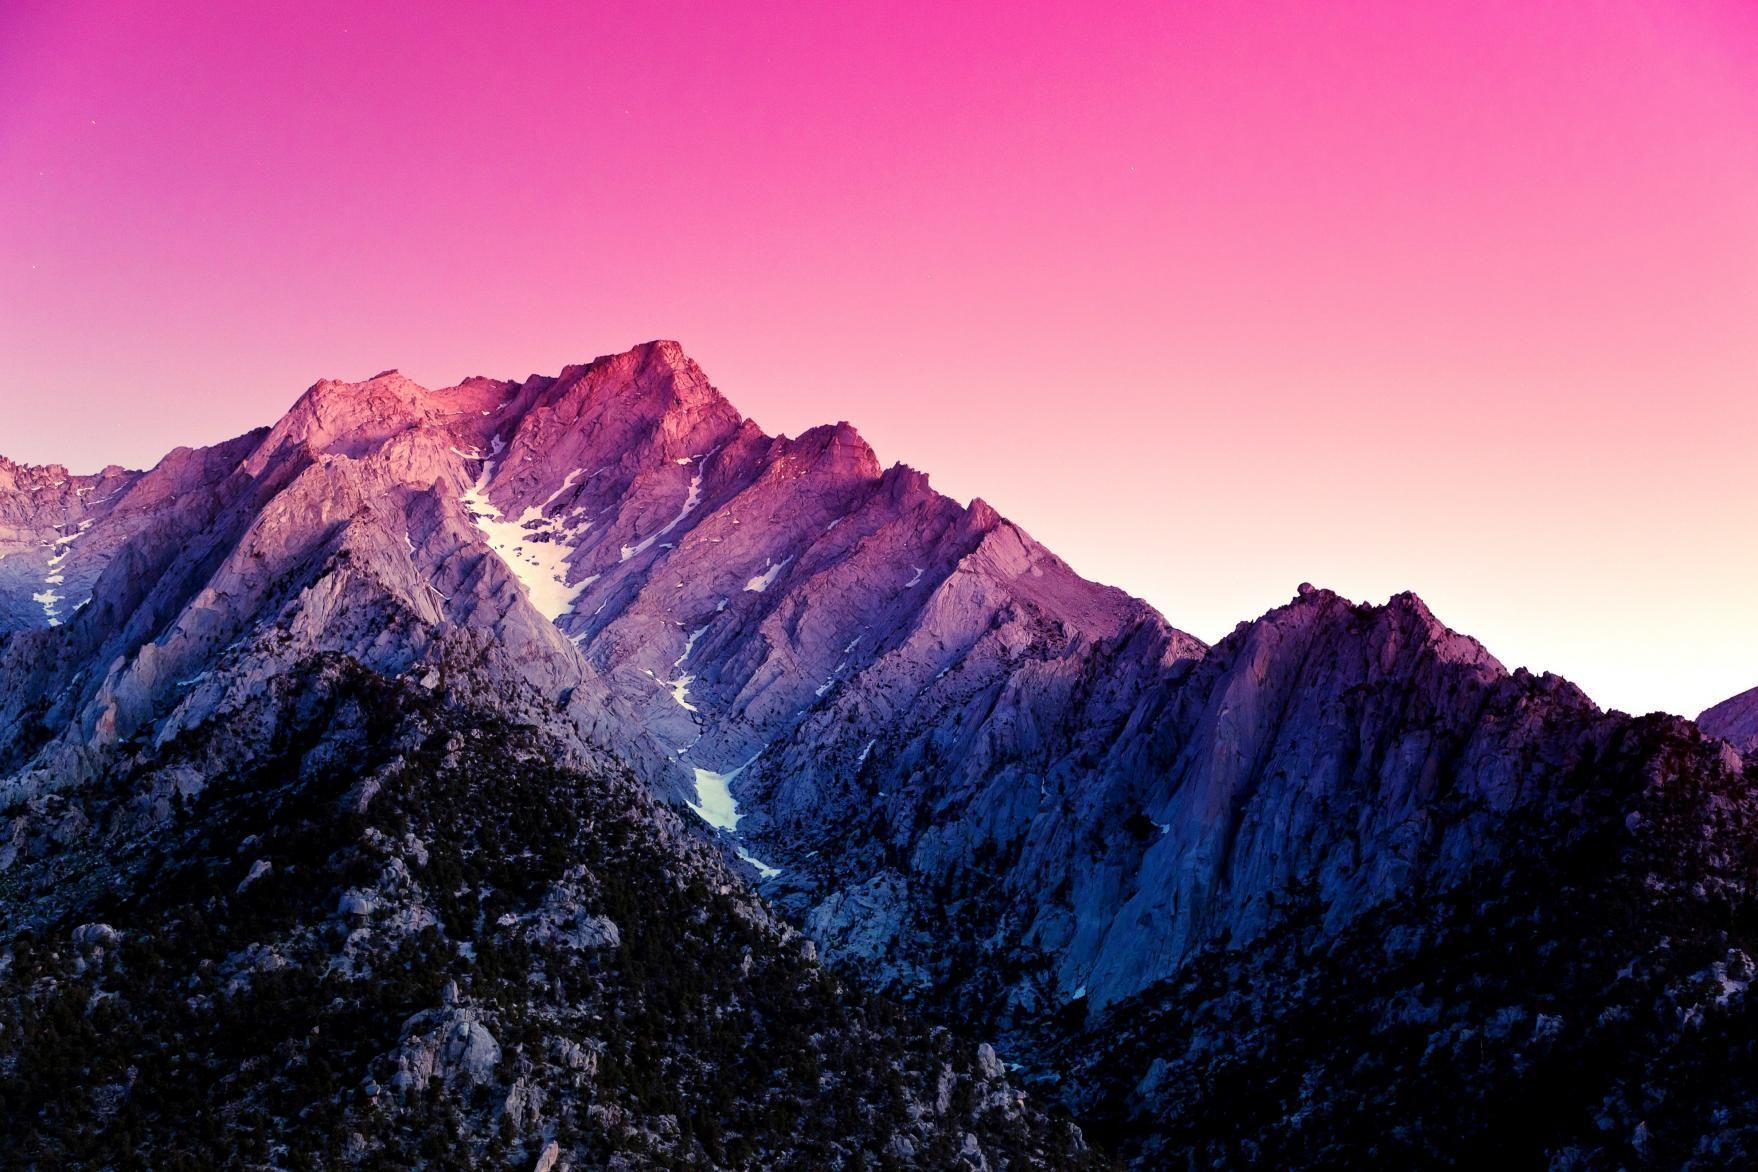 Telechargez Les Fonds D Ecran D Android 4 4 In 2020 Mountain Wallpaper Hd Nature Wallpapers Wallpaper Pc